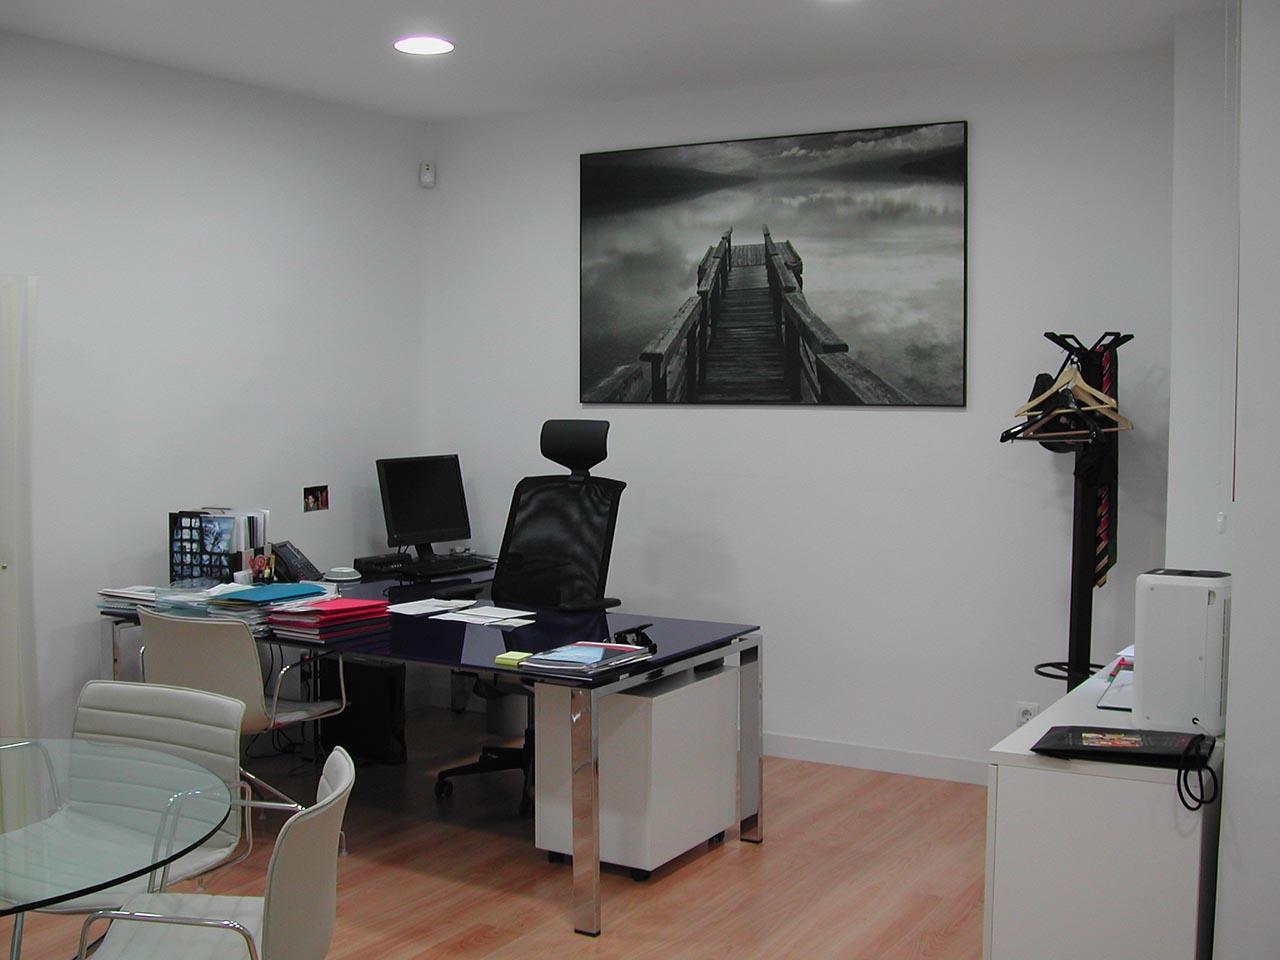 2.-Henderson Detalle despacho